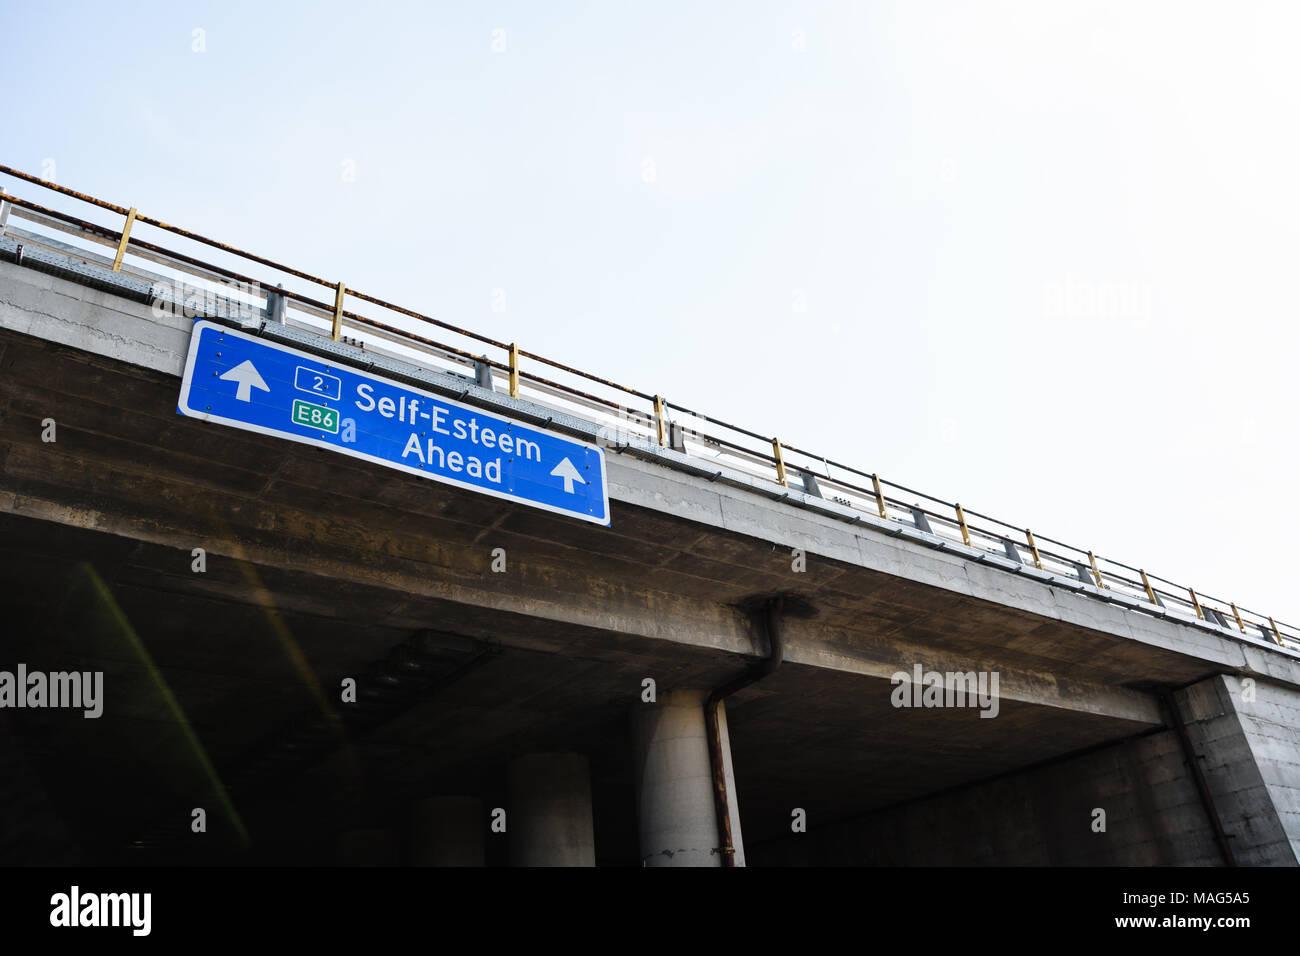 Self-Esteem Ahead Blue Road Sign Against Clear Sky - Stock Image